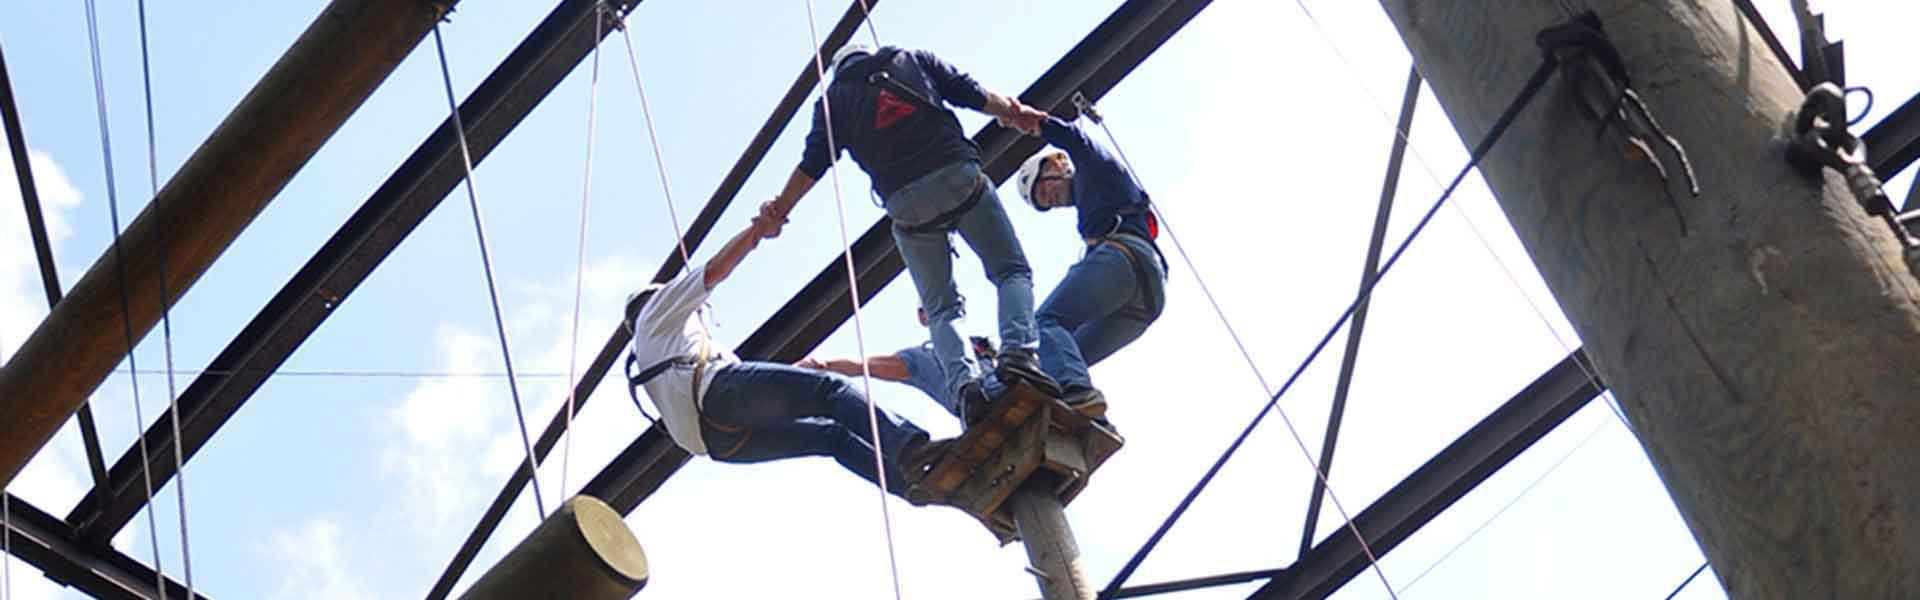 High Ropes Course   Bedrijfsuitjes in Twente